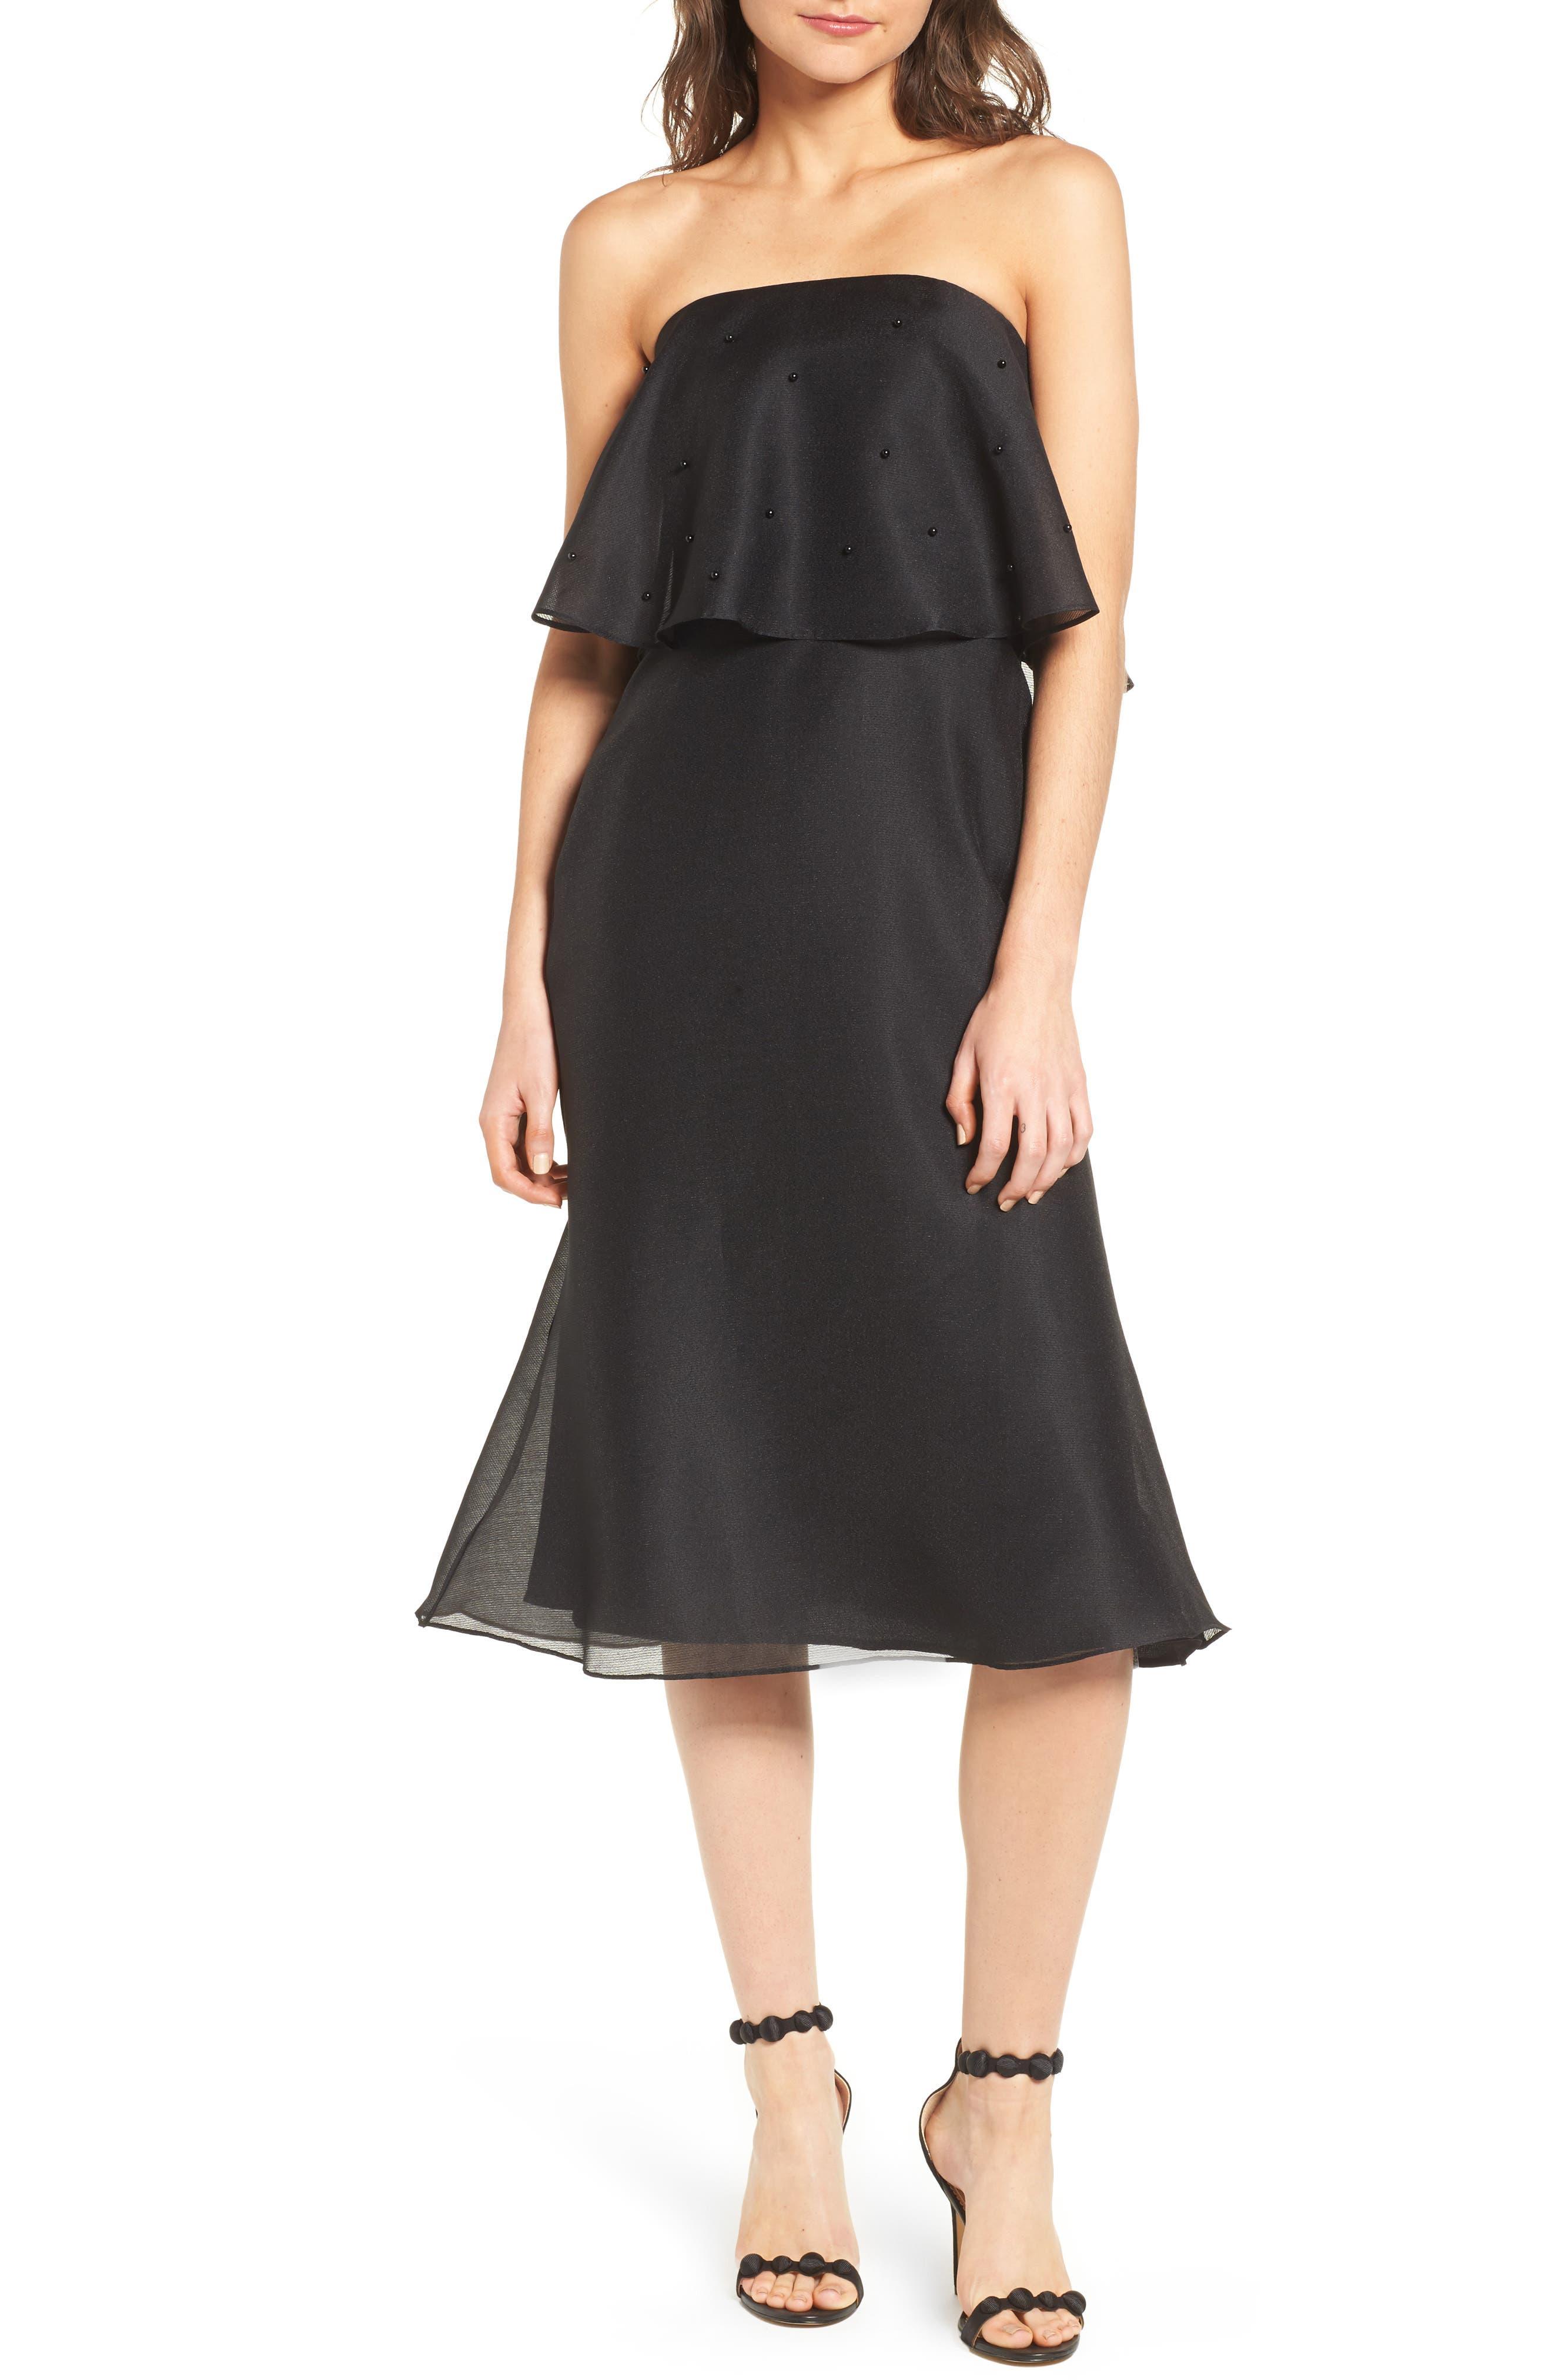 Call Me Strapless Dress,                             Main thumbnail 1, color,                             Black